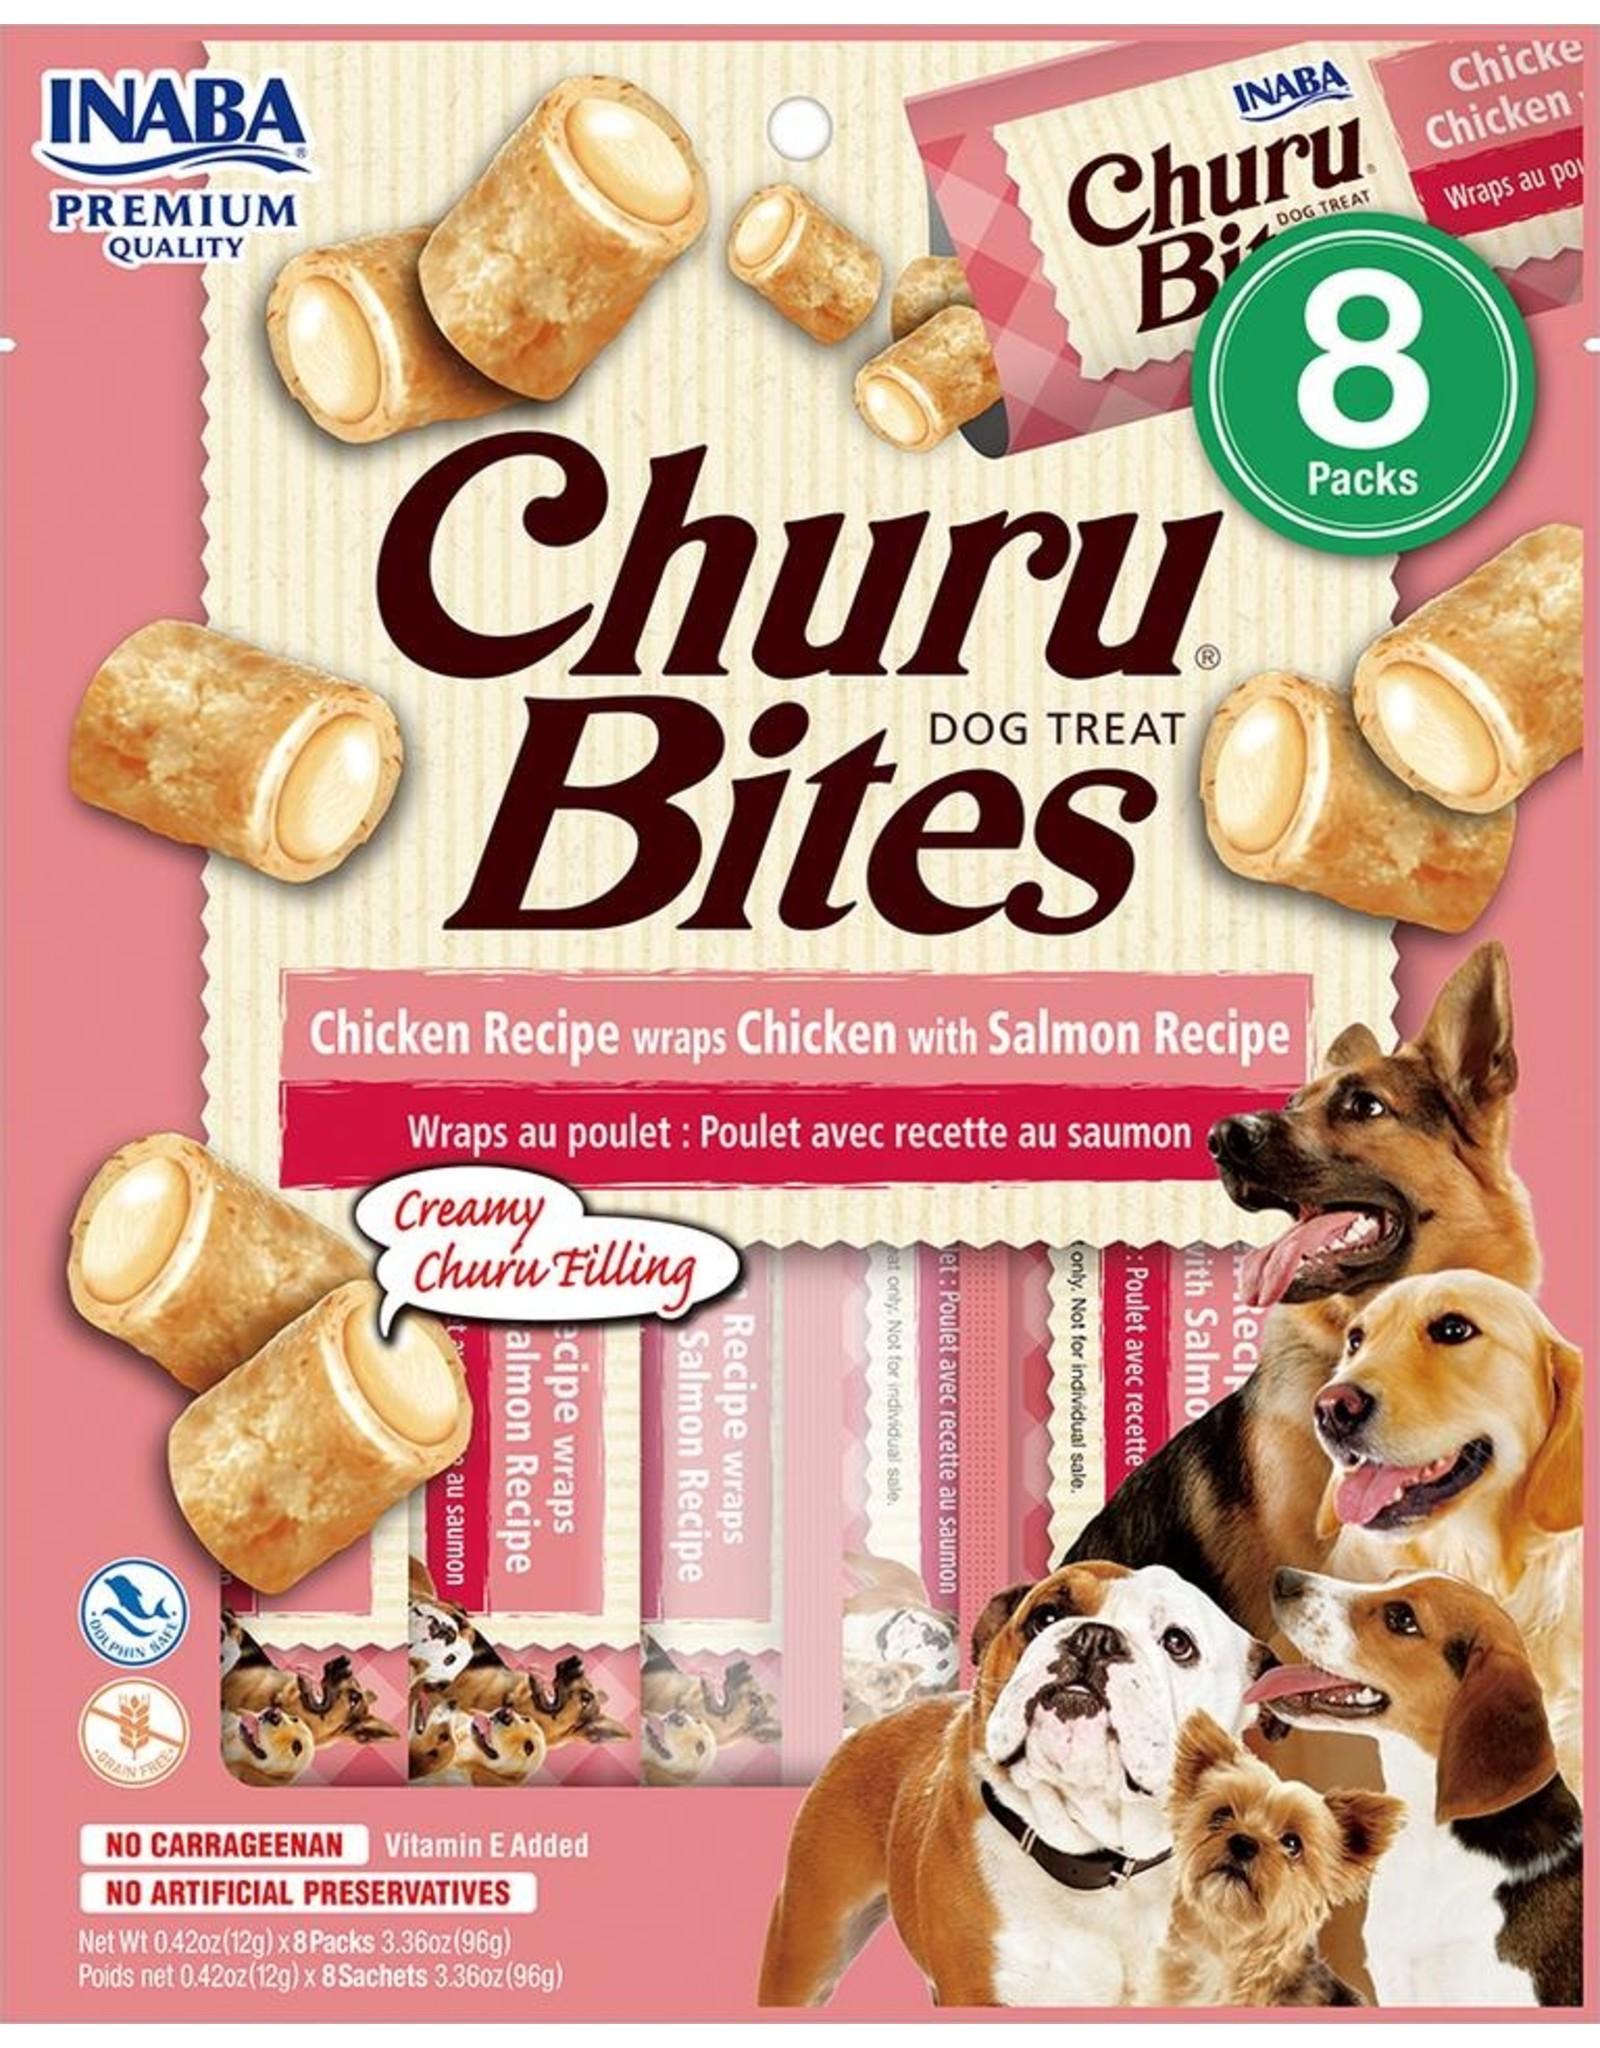 Inaba INABA DOG CHURU BITES CHICKEN RECIPE WRAPS CHICKEN WITH SALMON RECIPE 8-COUNT